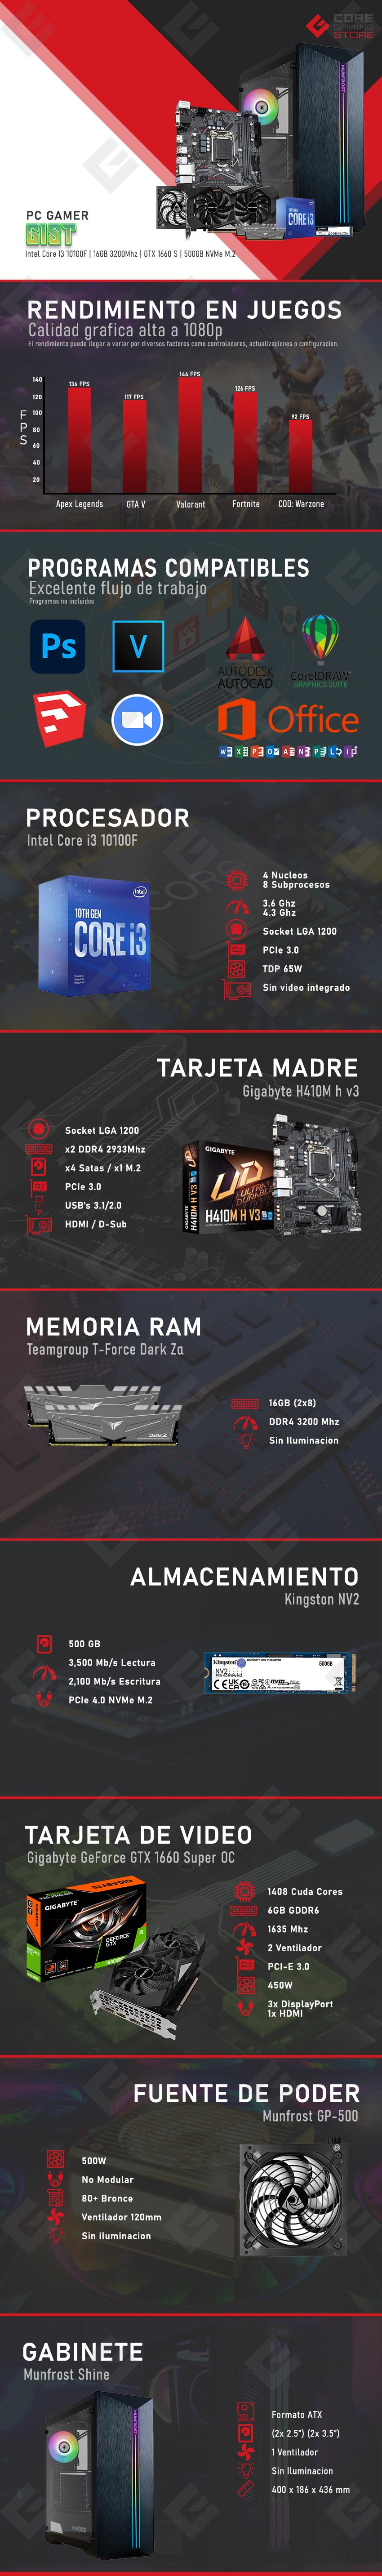 PC Gamer Gist Intel